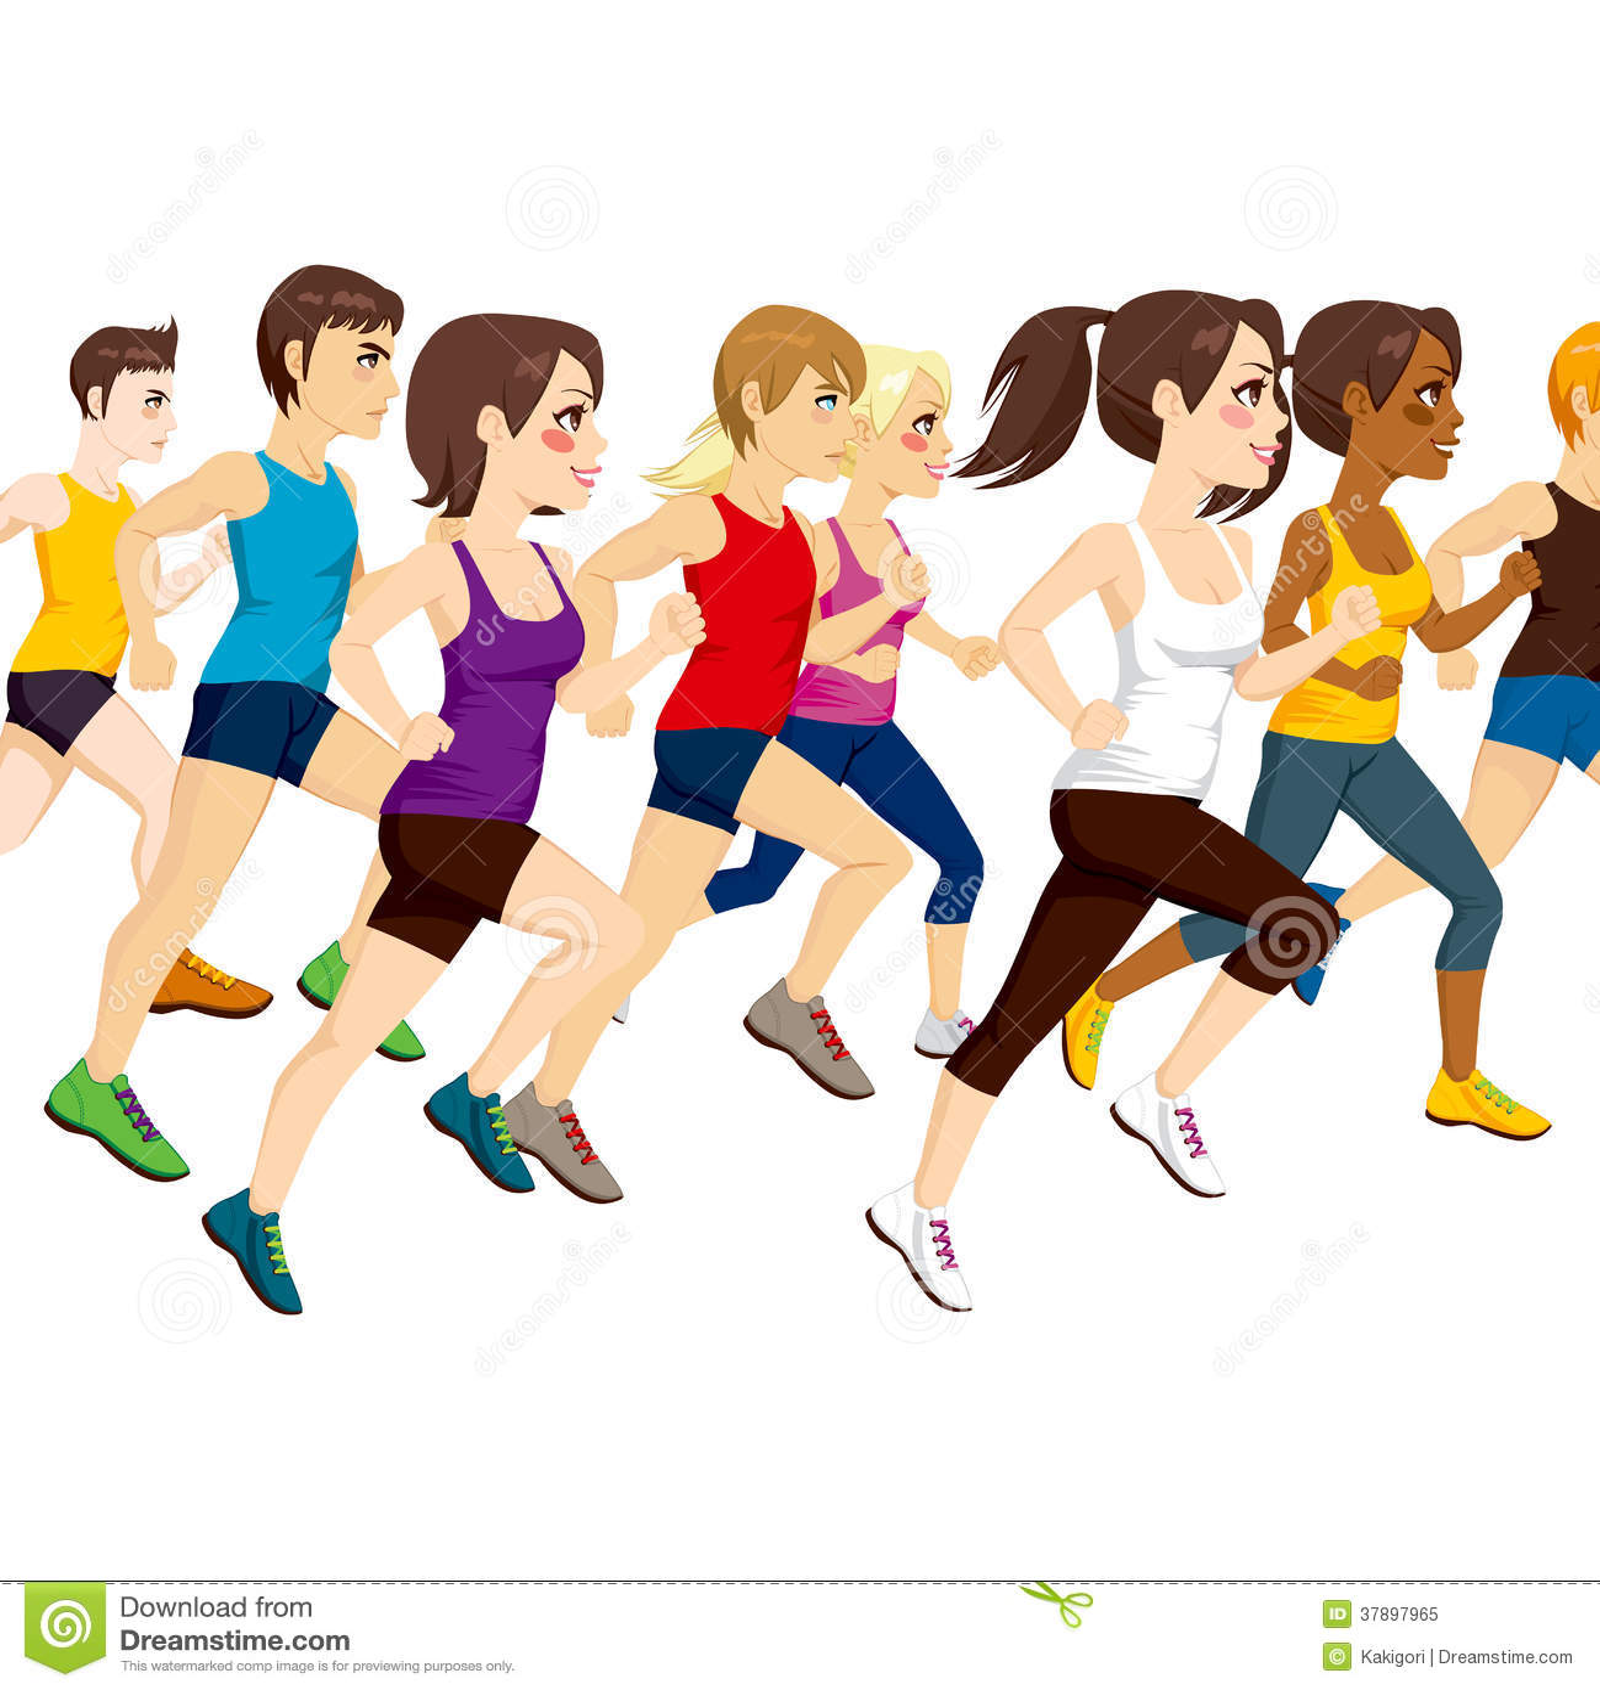 Group Of Athletes Running Royalty Free Stock Photo - Image: 37897965